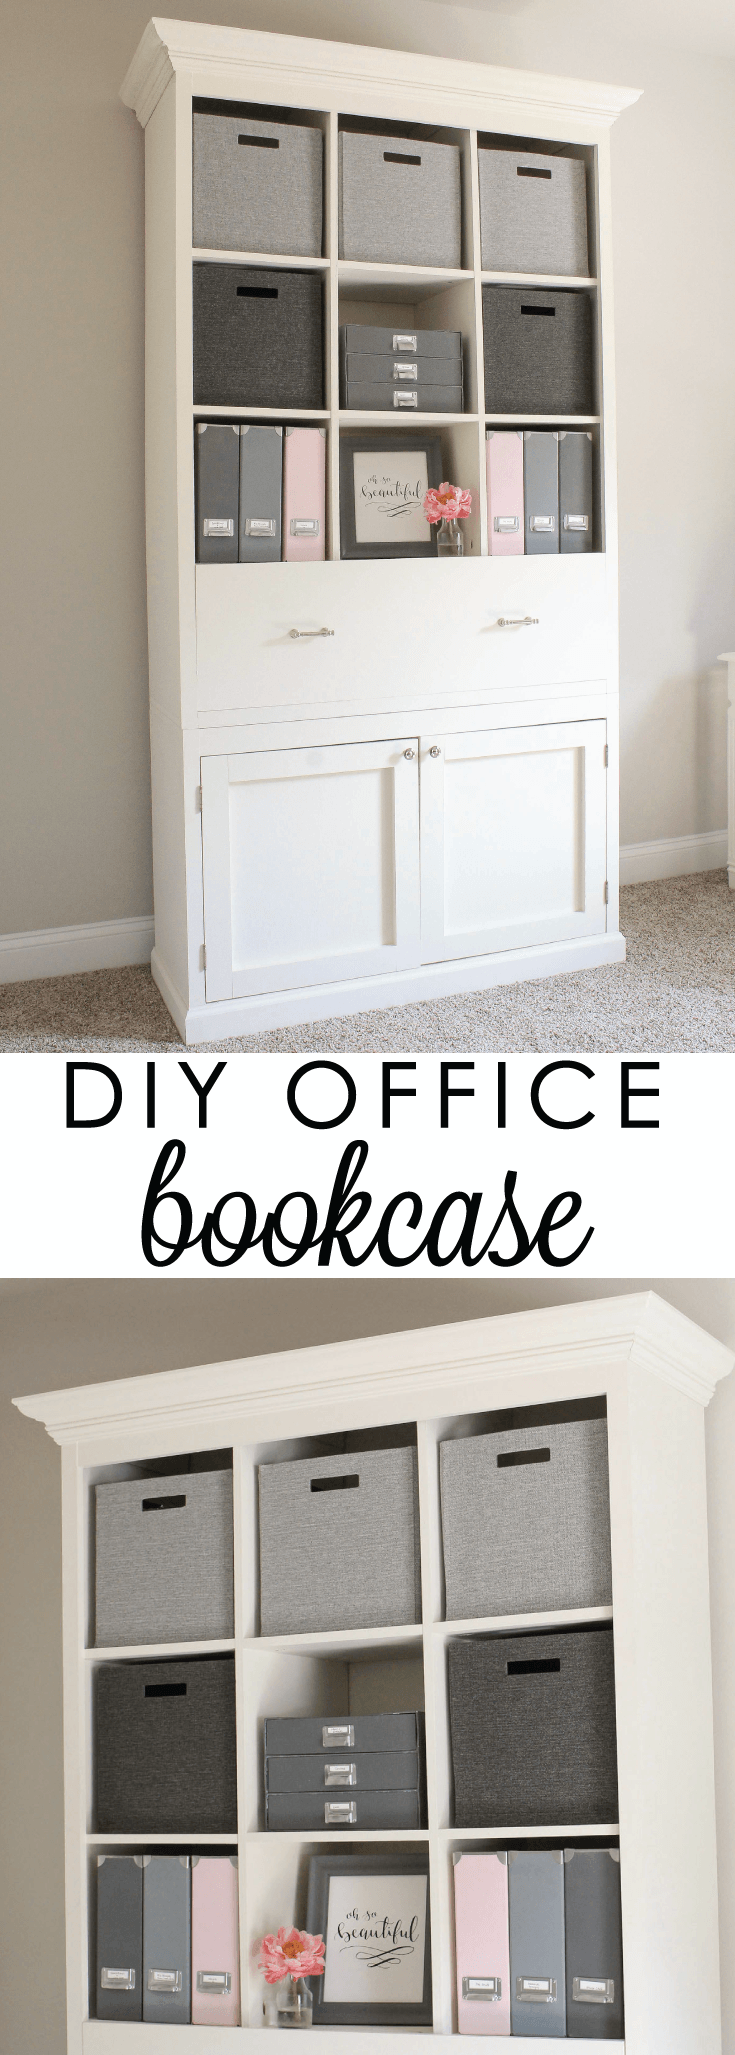 diy office storage ideas. DIY Office Storage Cabinet Bookcase Diy Ideas